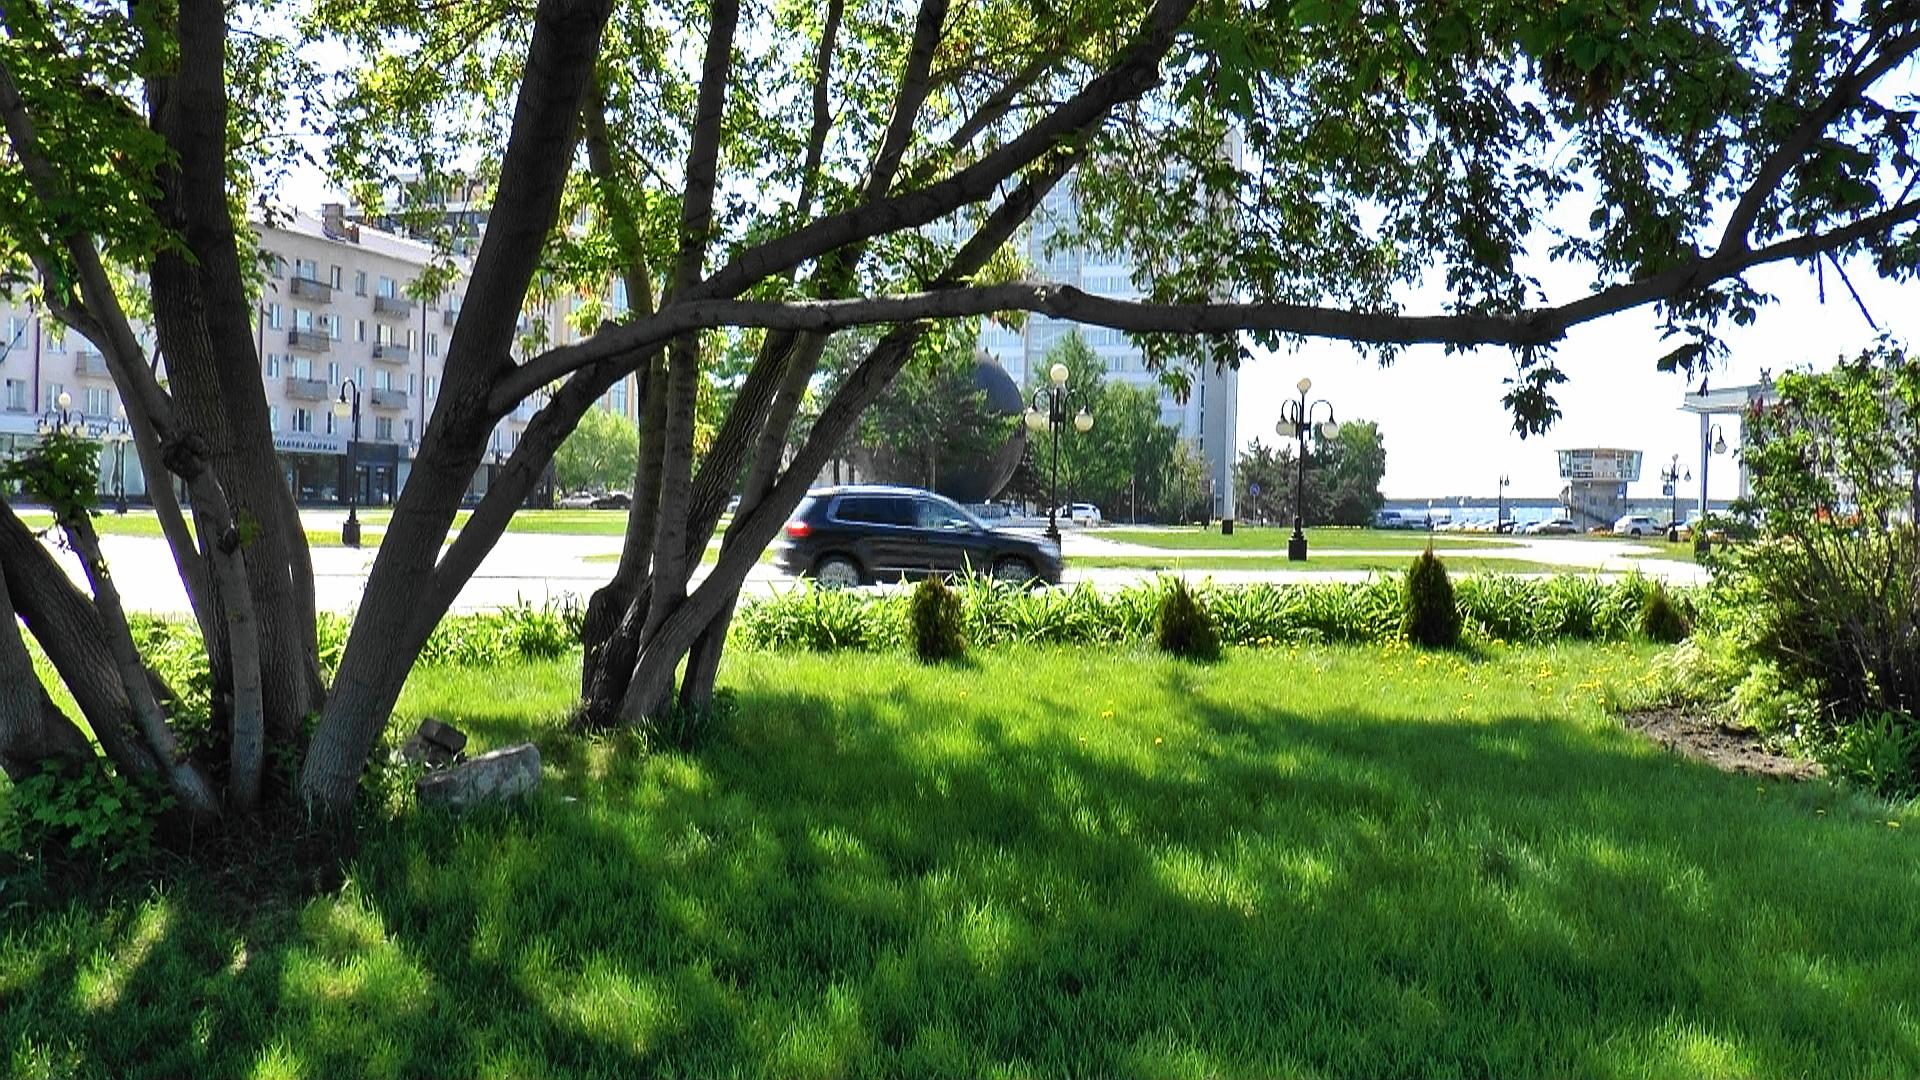 картинки деревьев на улицах уйдут твои невзгоды